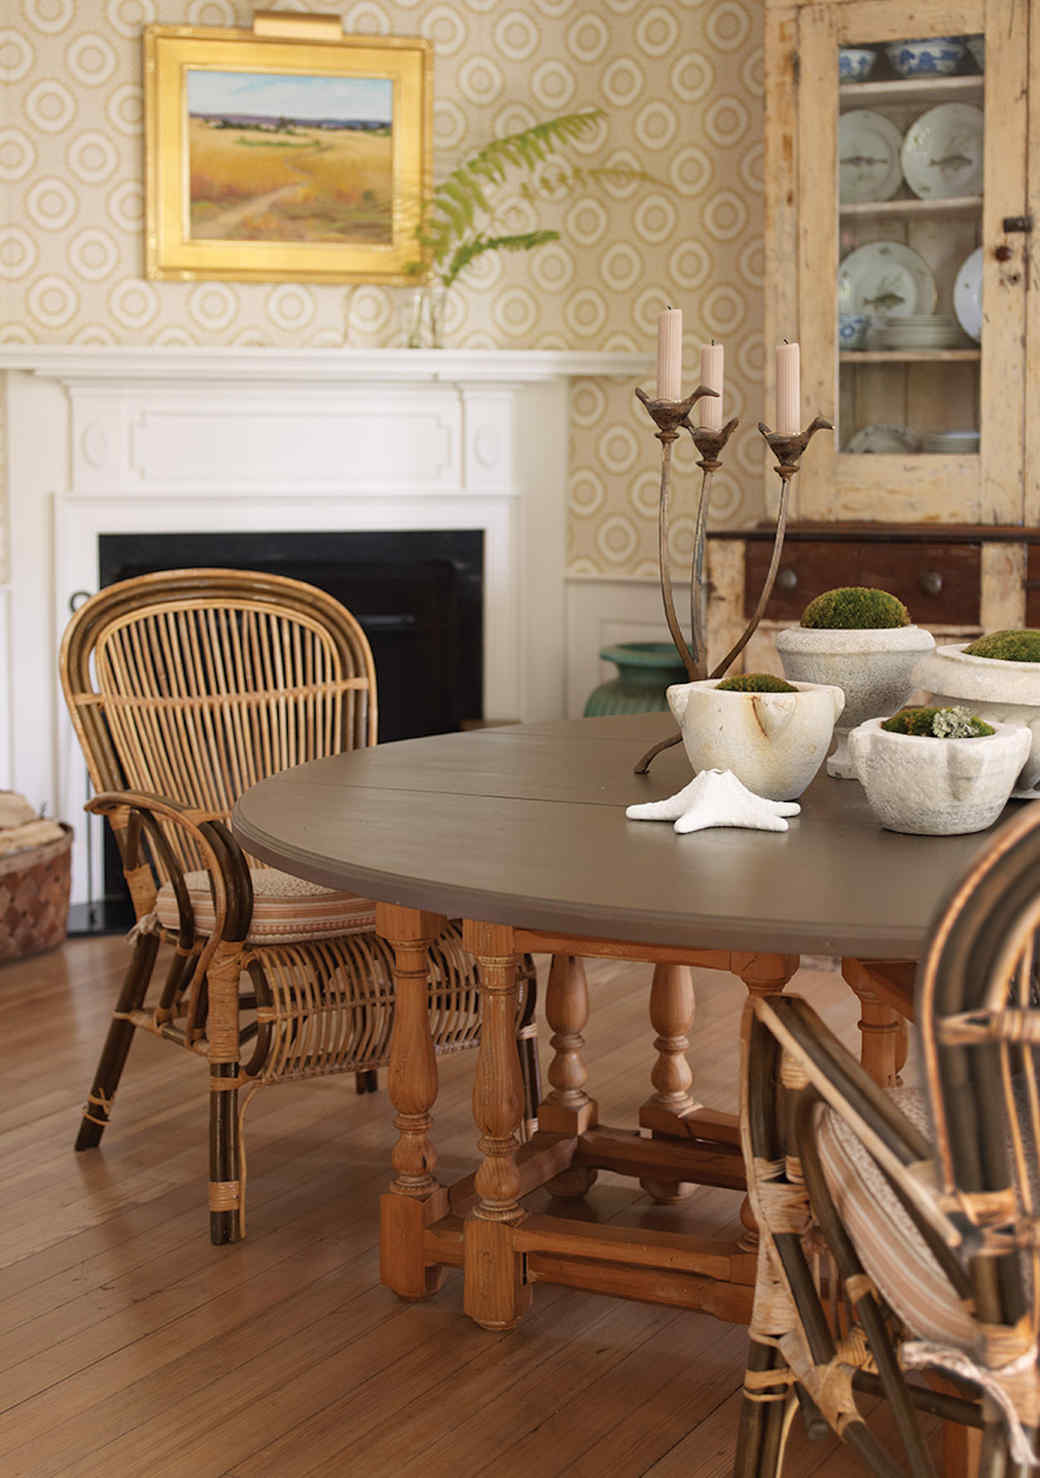 wood-dining-room-1016.jpg (skyword:349648)